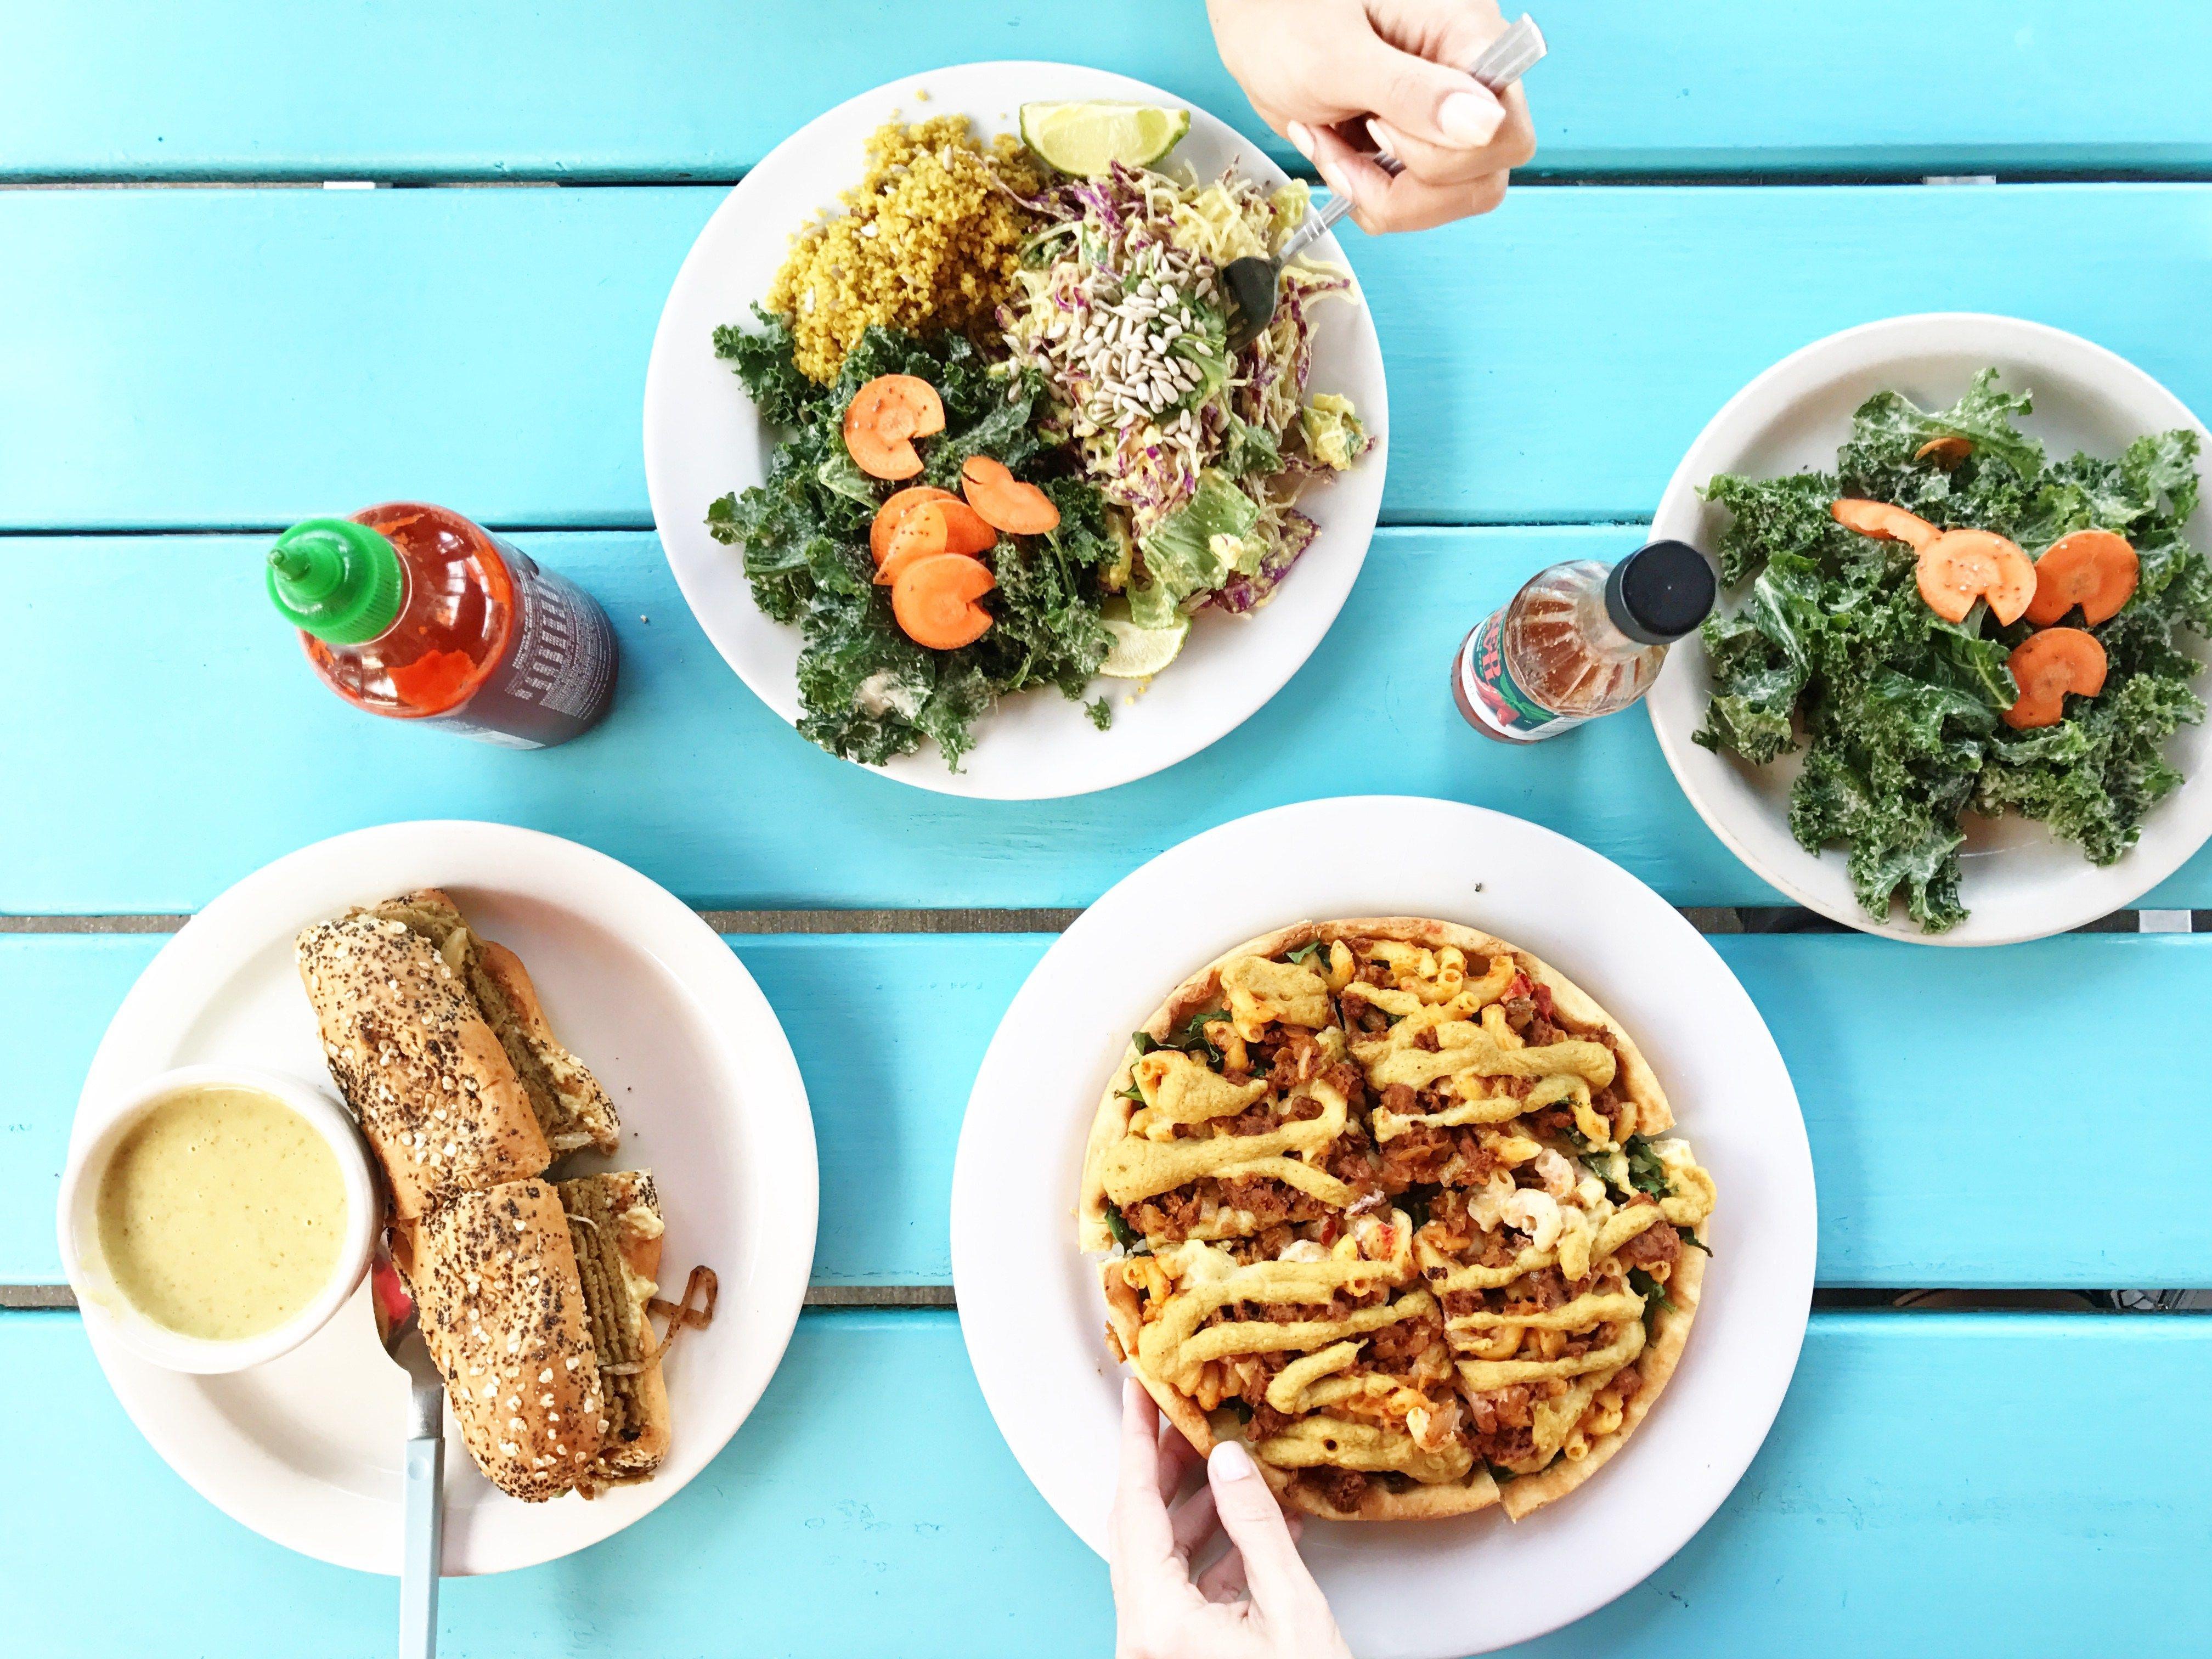 25 Best Spots For Vegan Food In Austin A Taste Of Koko Best Vegan Restaurants Vegan Restaurants Vegan Recipes